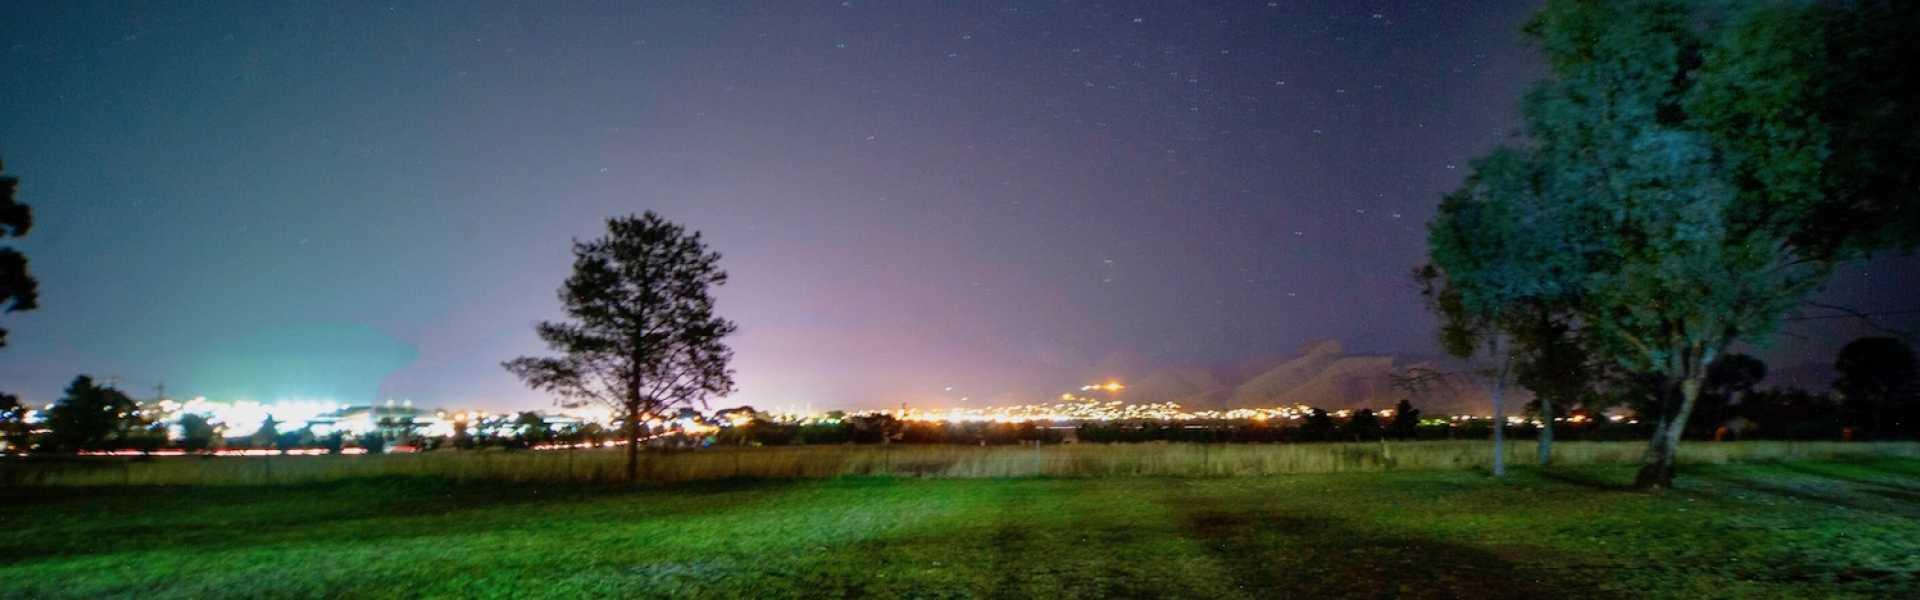 Kui Parks, City Lights Caravan Park, Tamworth